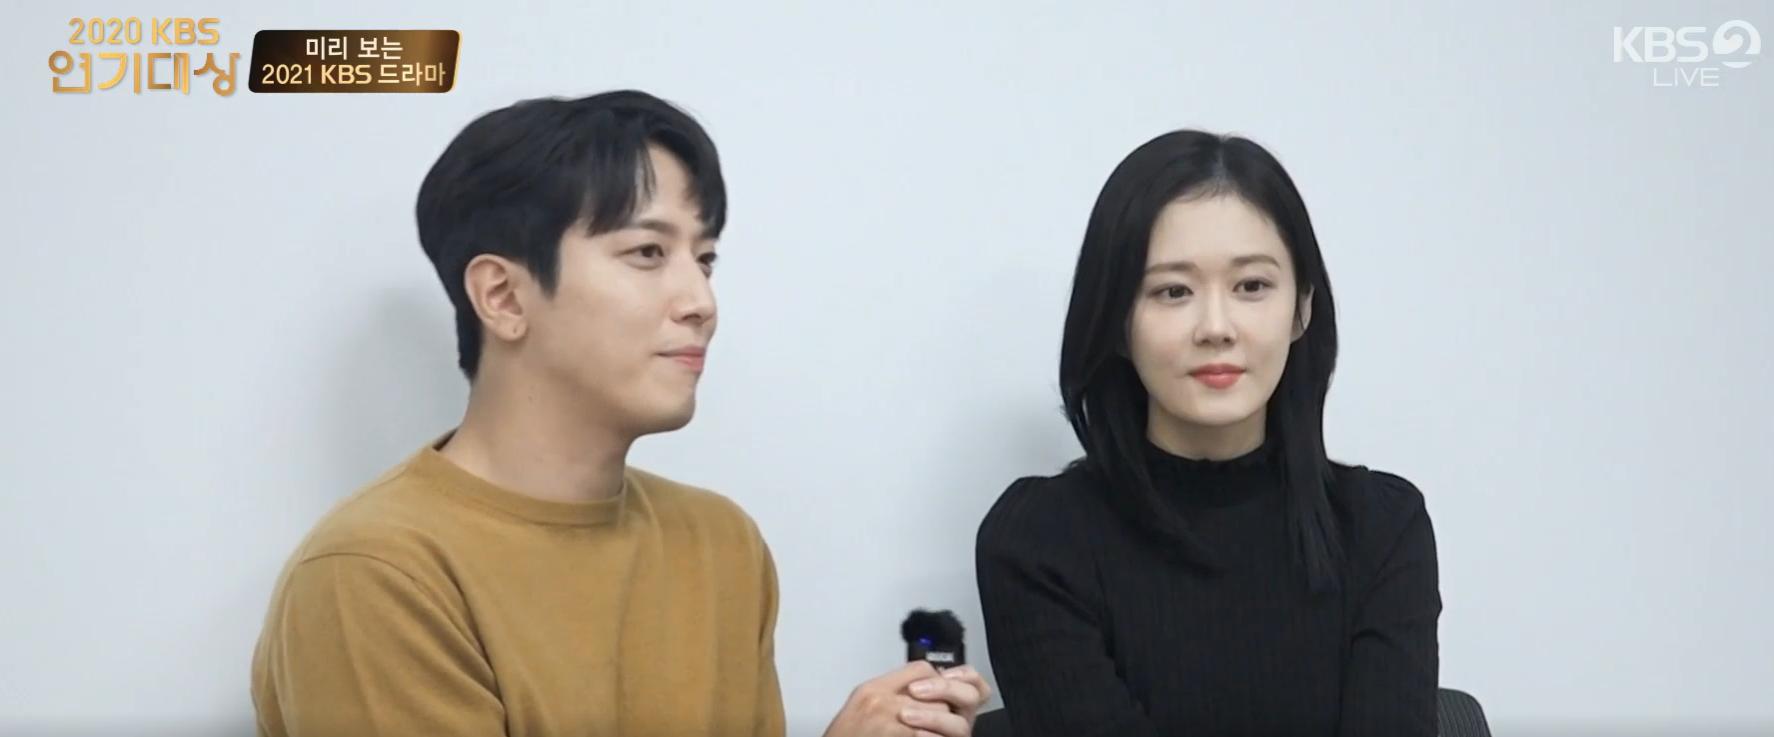 jang-na-ra-jung-yong-hwa-confirmed-to-star-in-new-kbs-drama-daebak-real-estate